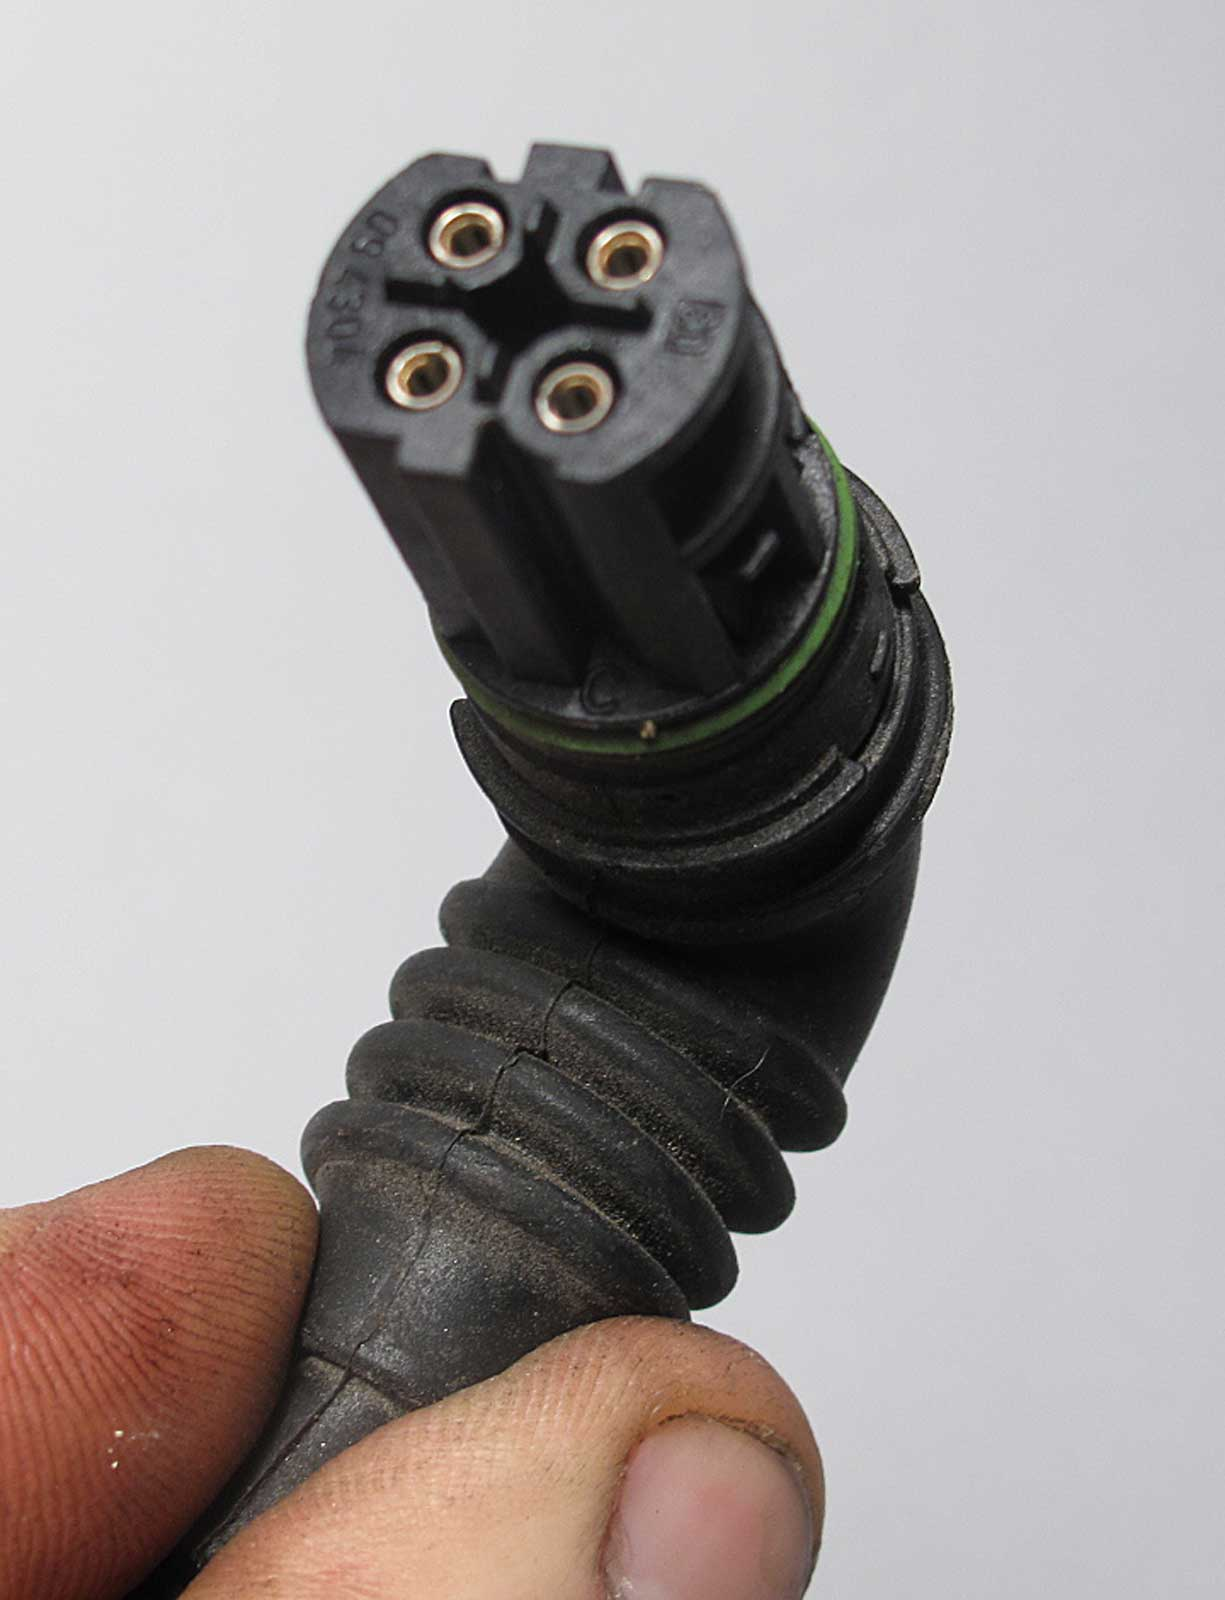 2005 Bmw 745i Engine Diagram additionally 322066748540 moreover 13627568421X5 moreover Intermotor Ignition Knock Detonation Sensor Mpn Ks252 moreover 13627568421. on 13627568421